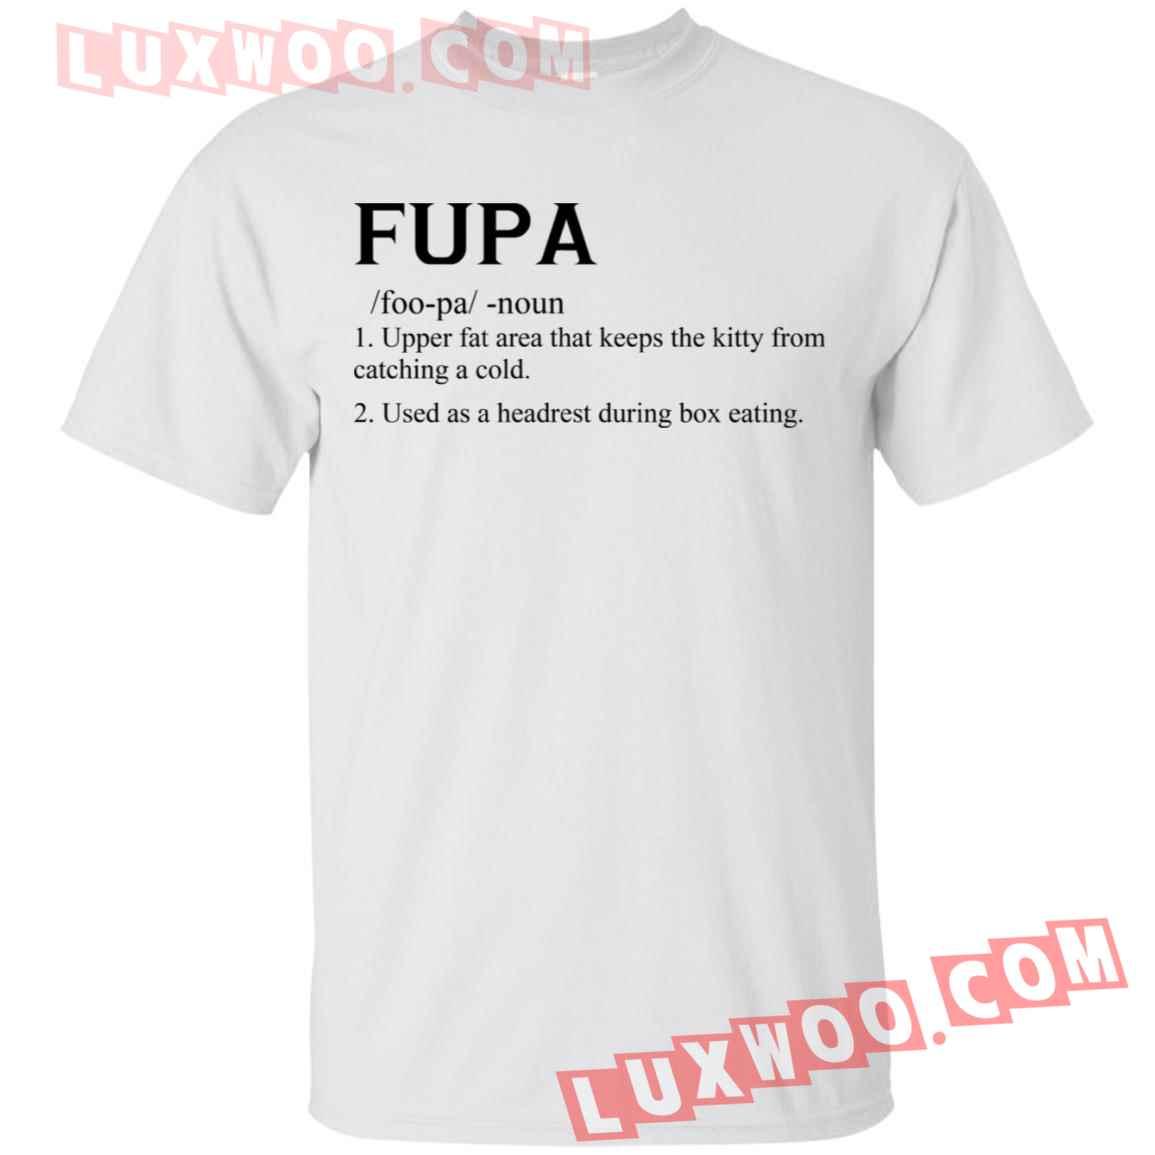 Fupa Shirt Fupa Definition Shirt